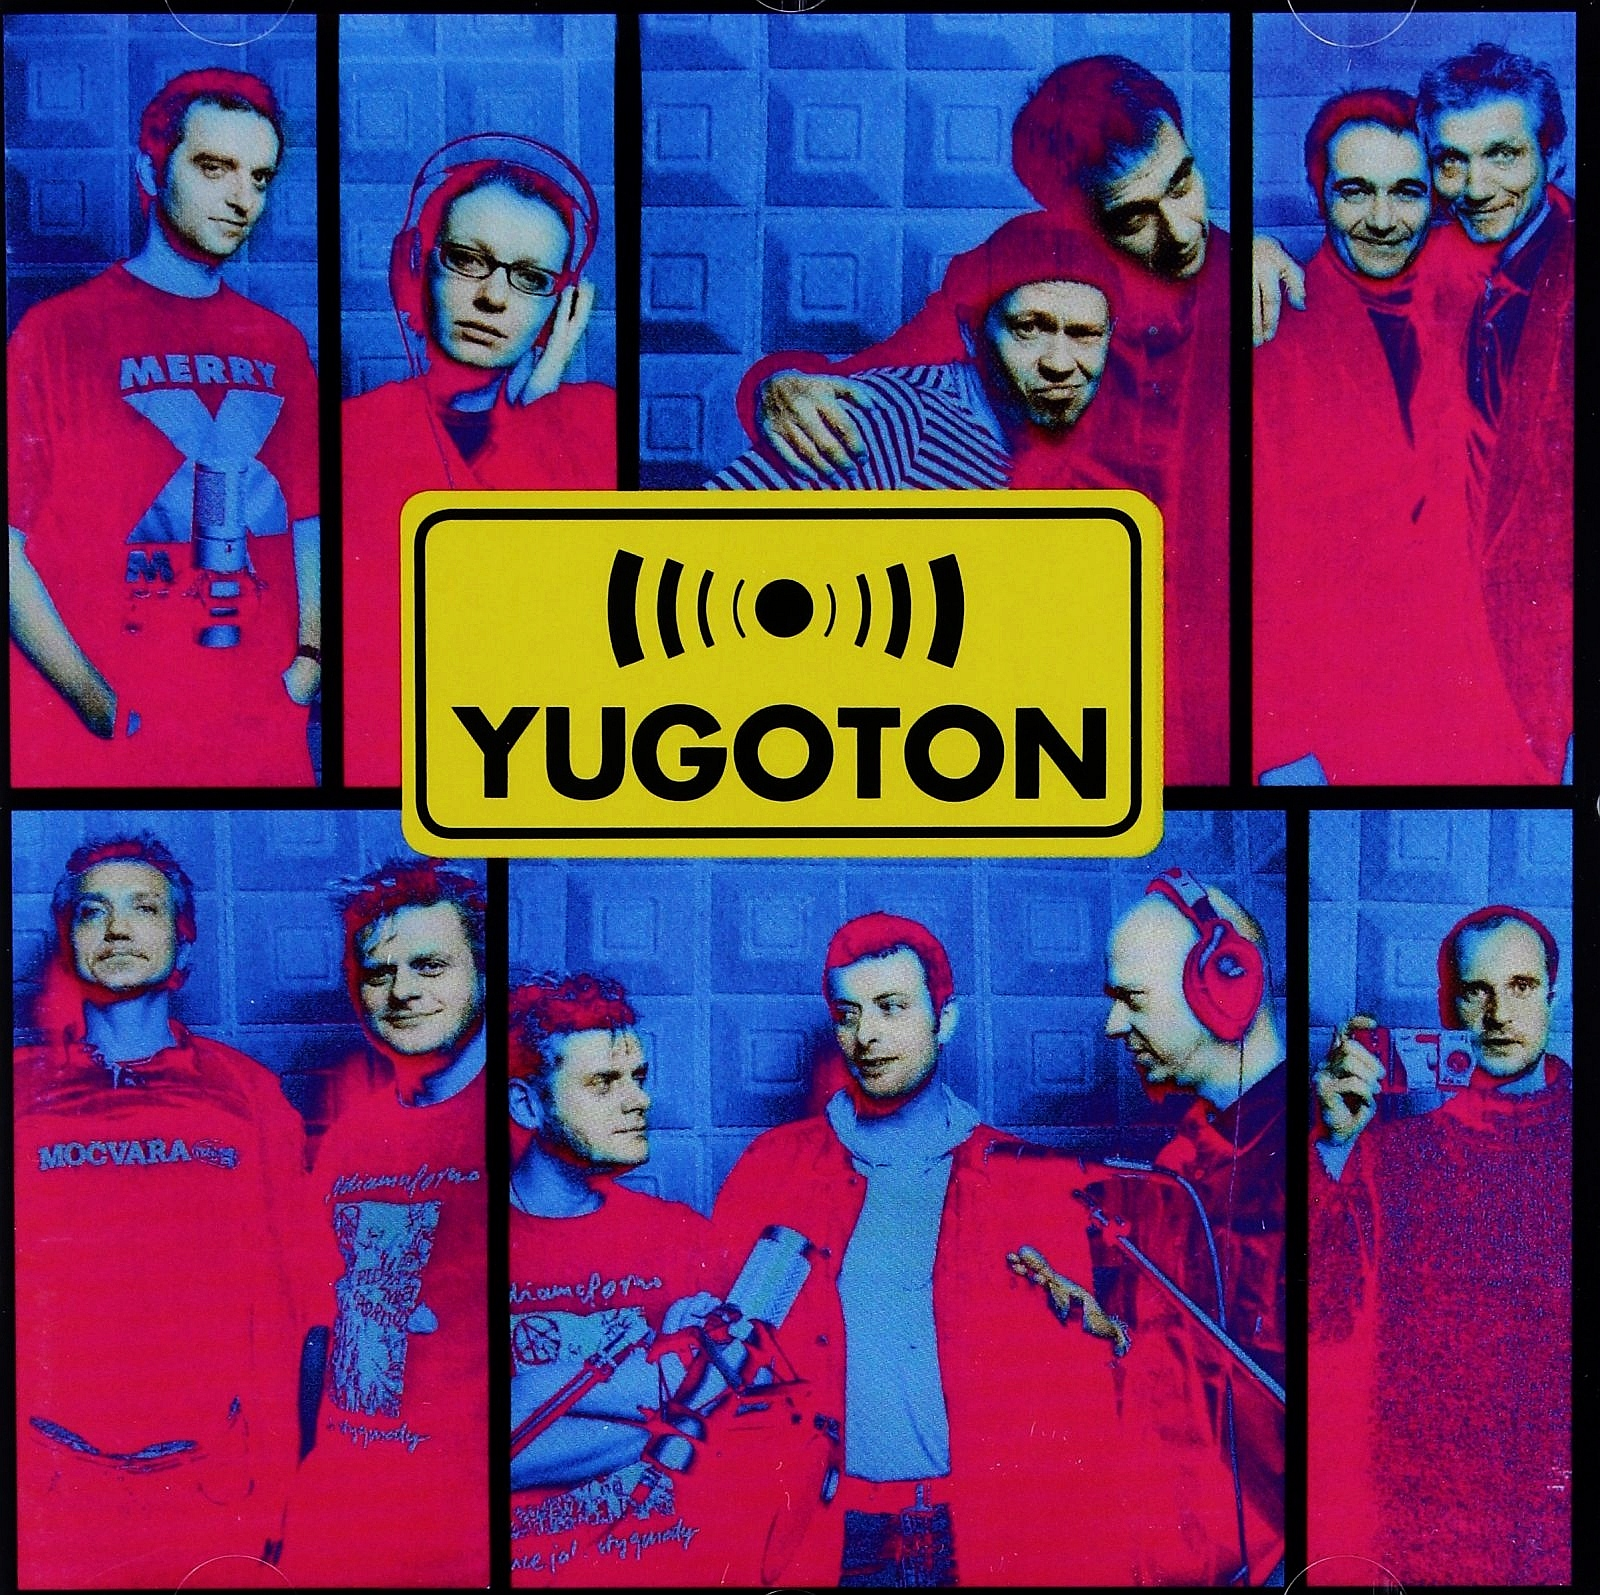 YUGOTON – Yugoton